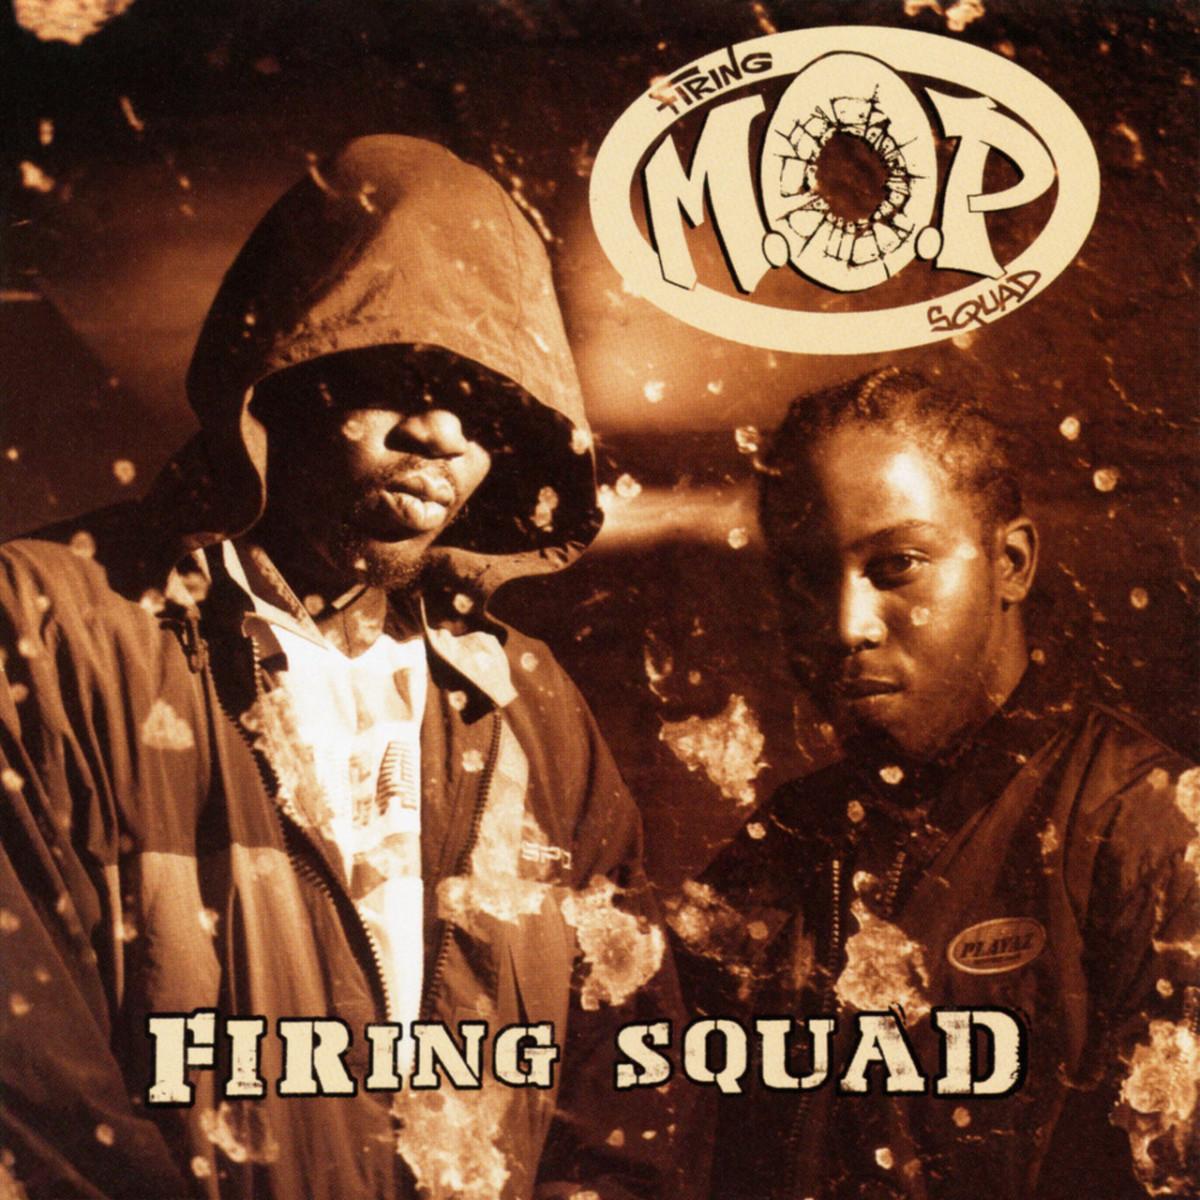 07. M.O.P. feat. Kool G Rap